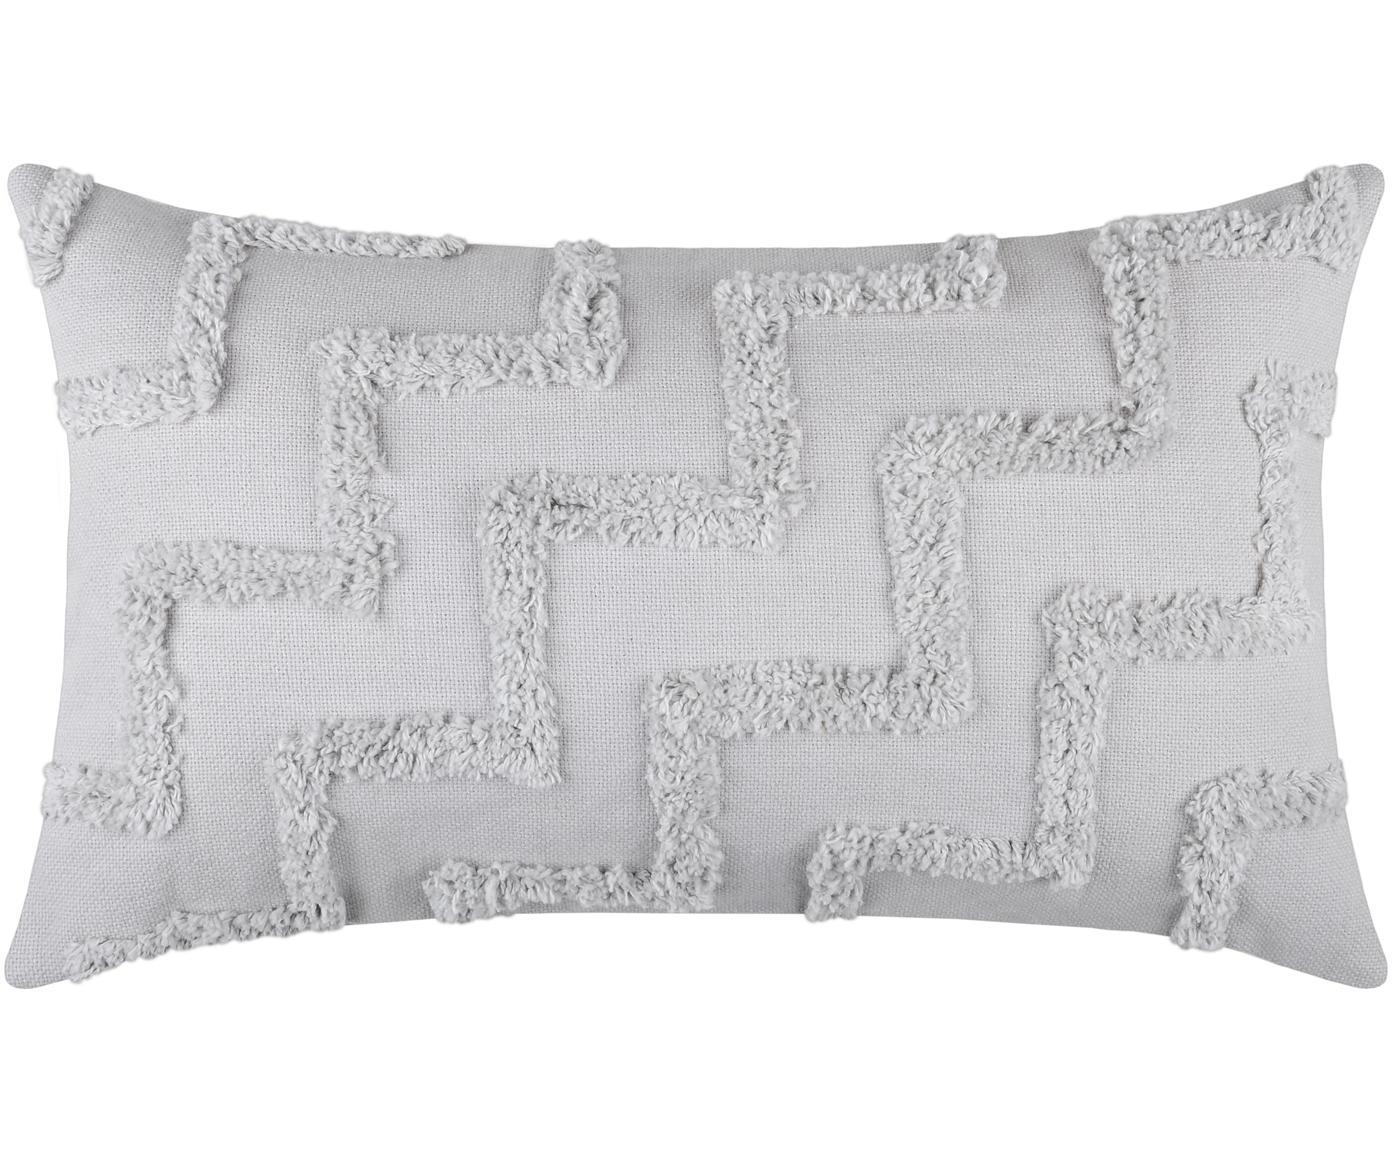 Cojín texturizado Tiksi, estilo boho, con relleno, Funda: 100%algodón, Gris, An 30 x L 50 cm